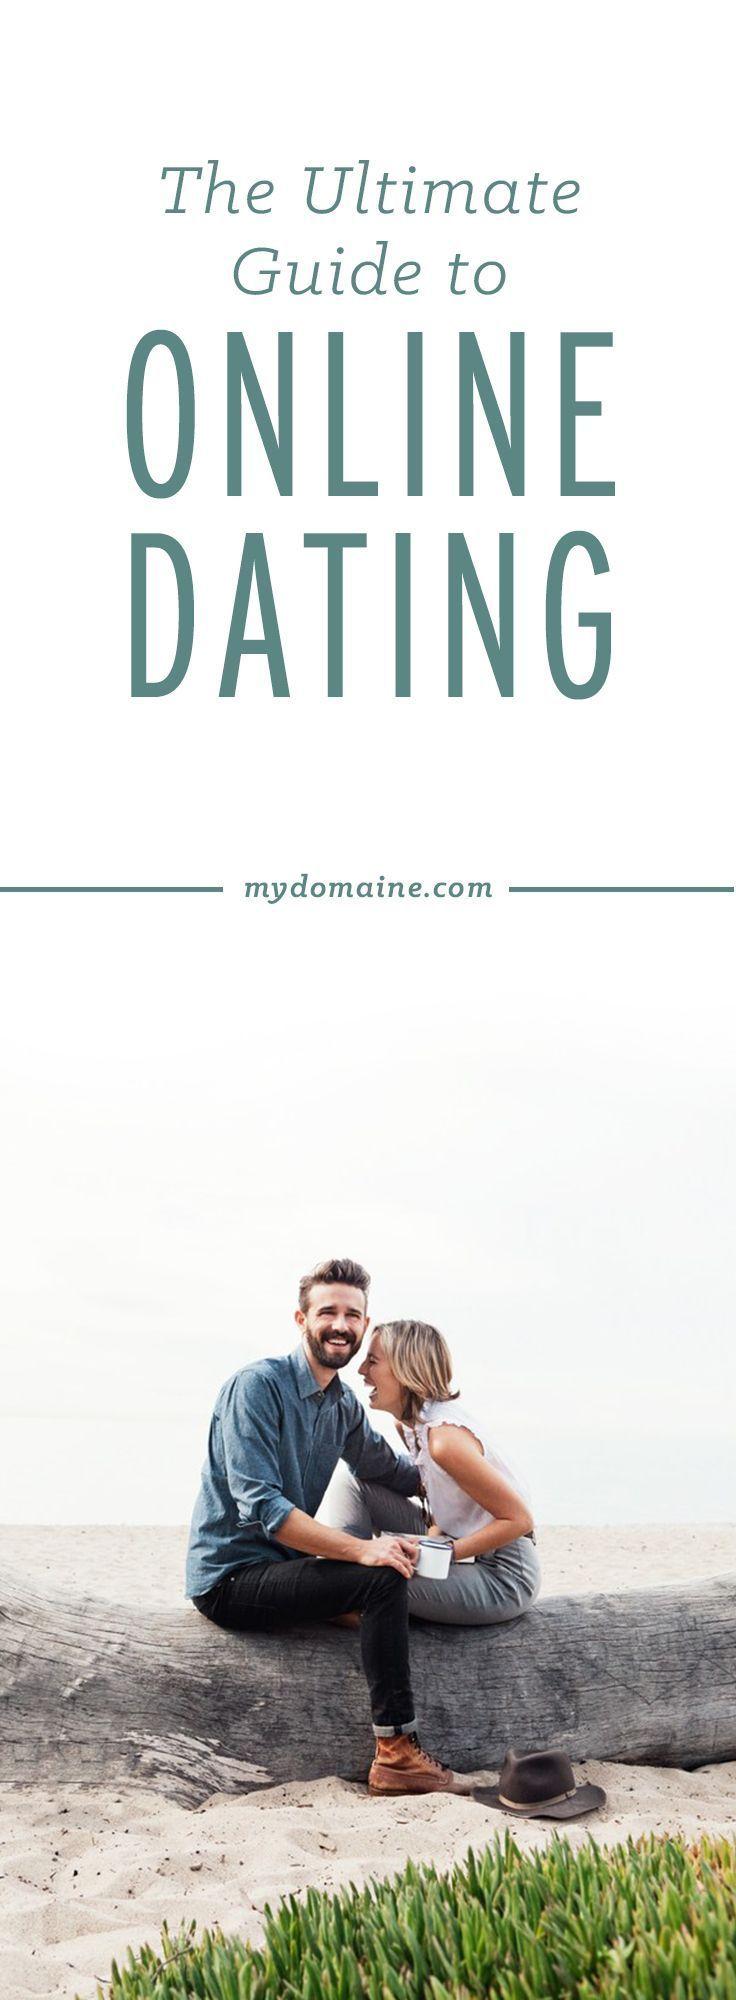 na dating